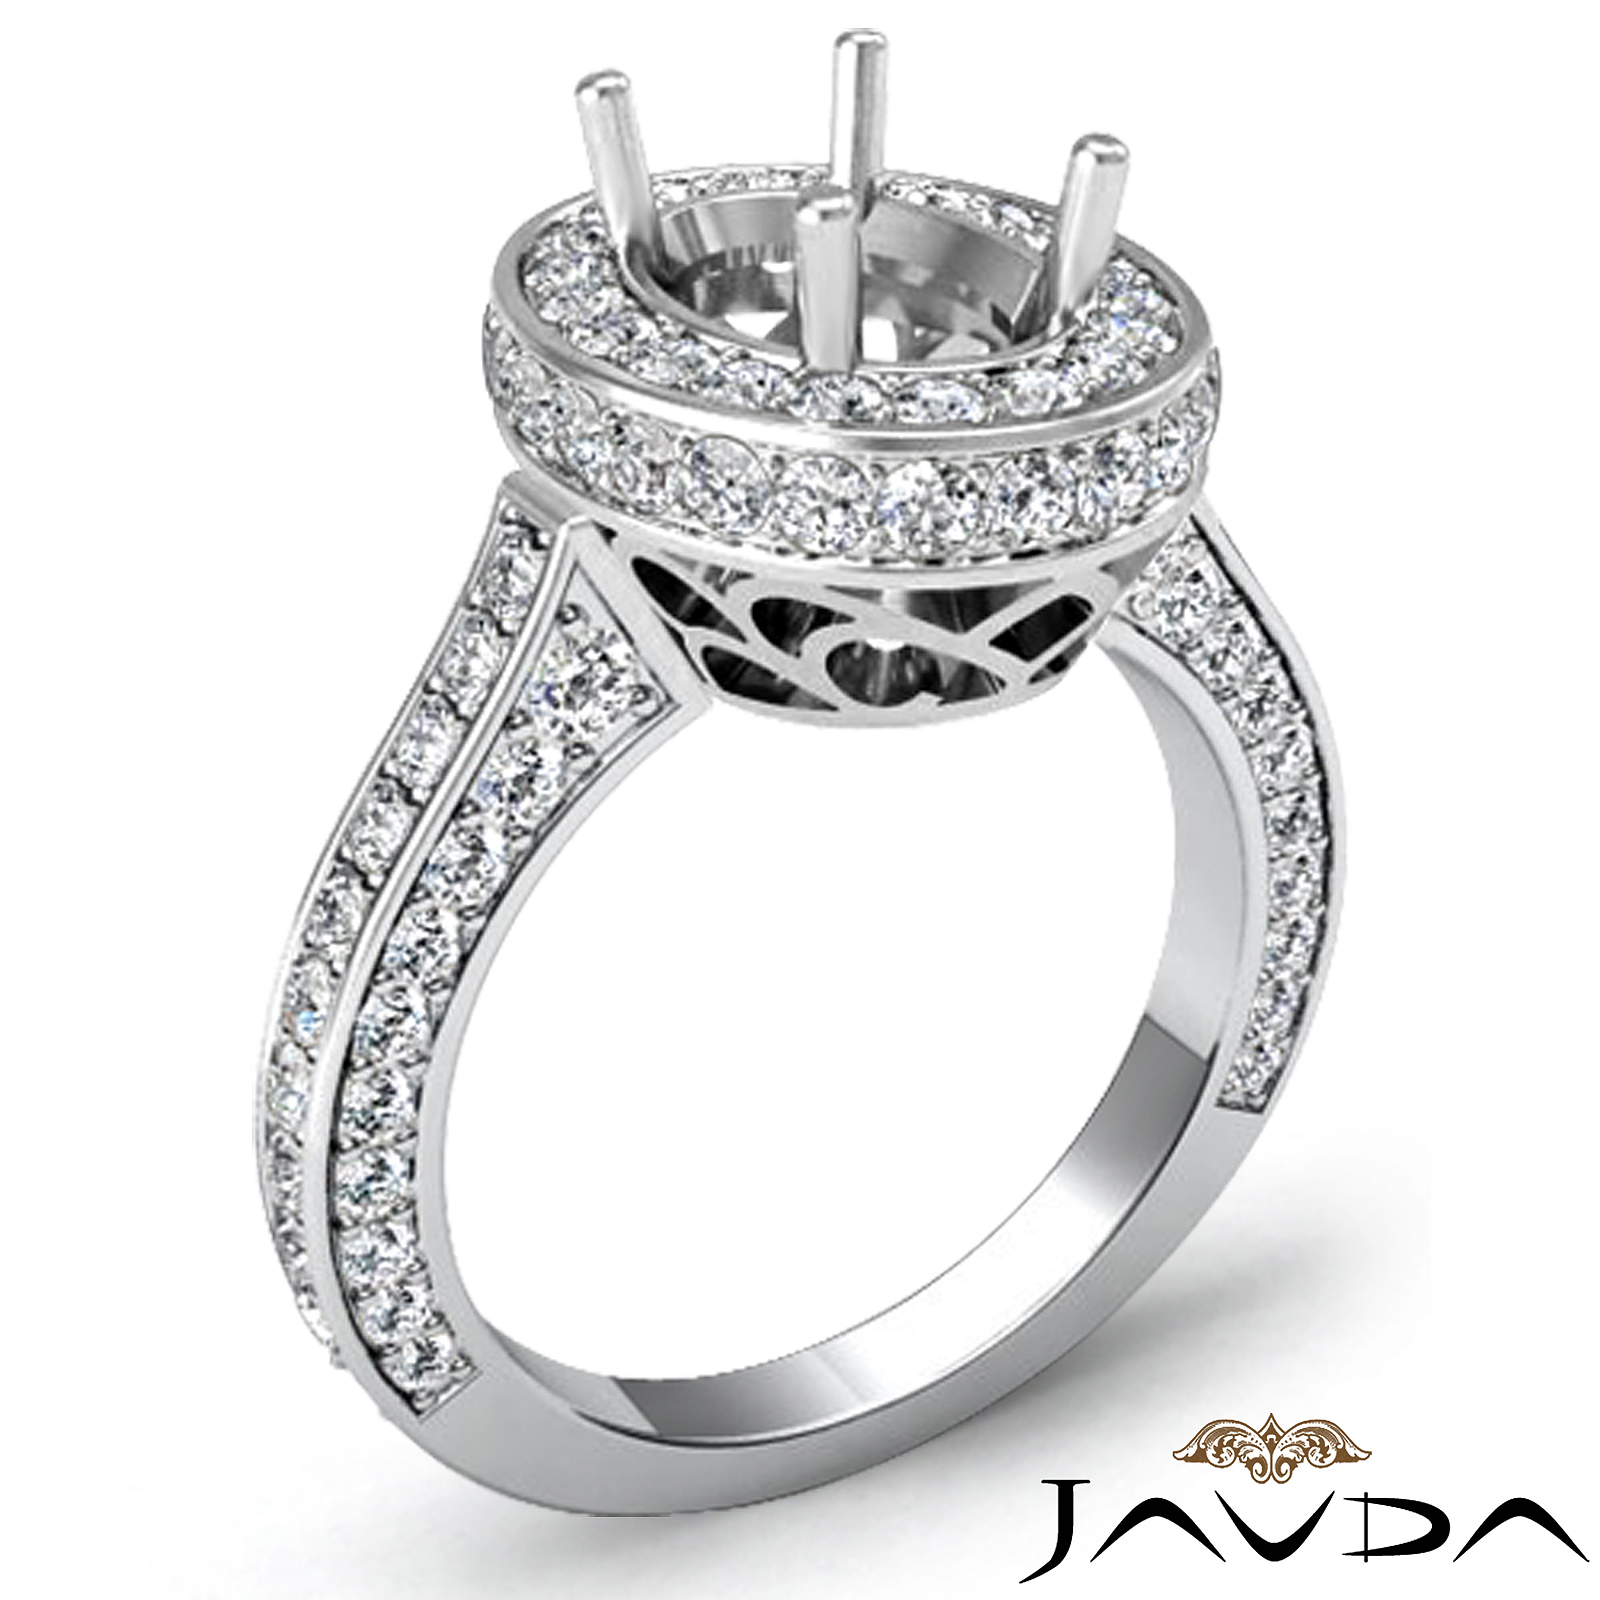 halo pave setting diamond engagement oval semi mount ring. Black Bedroom Furniture Sets. Home Design Ideas